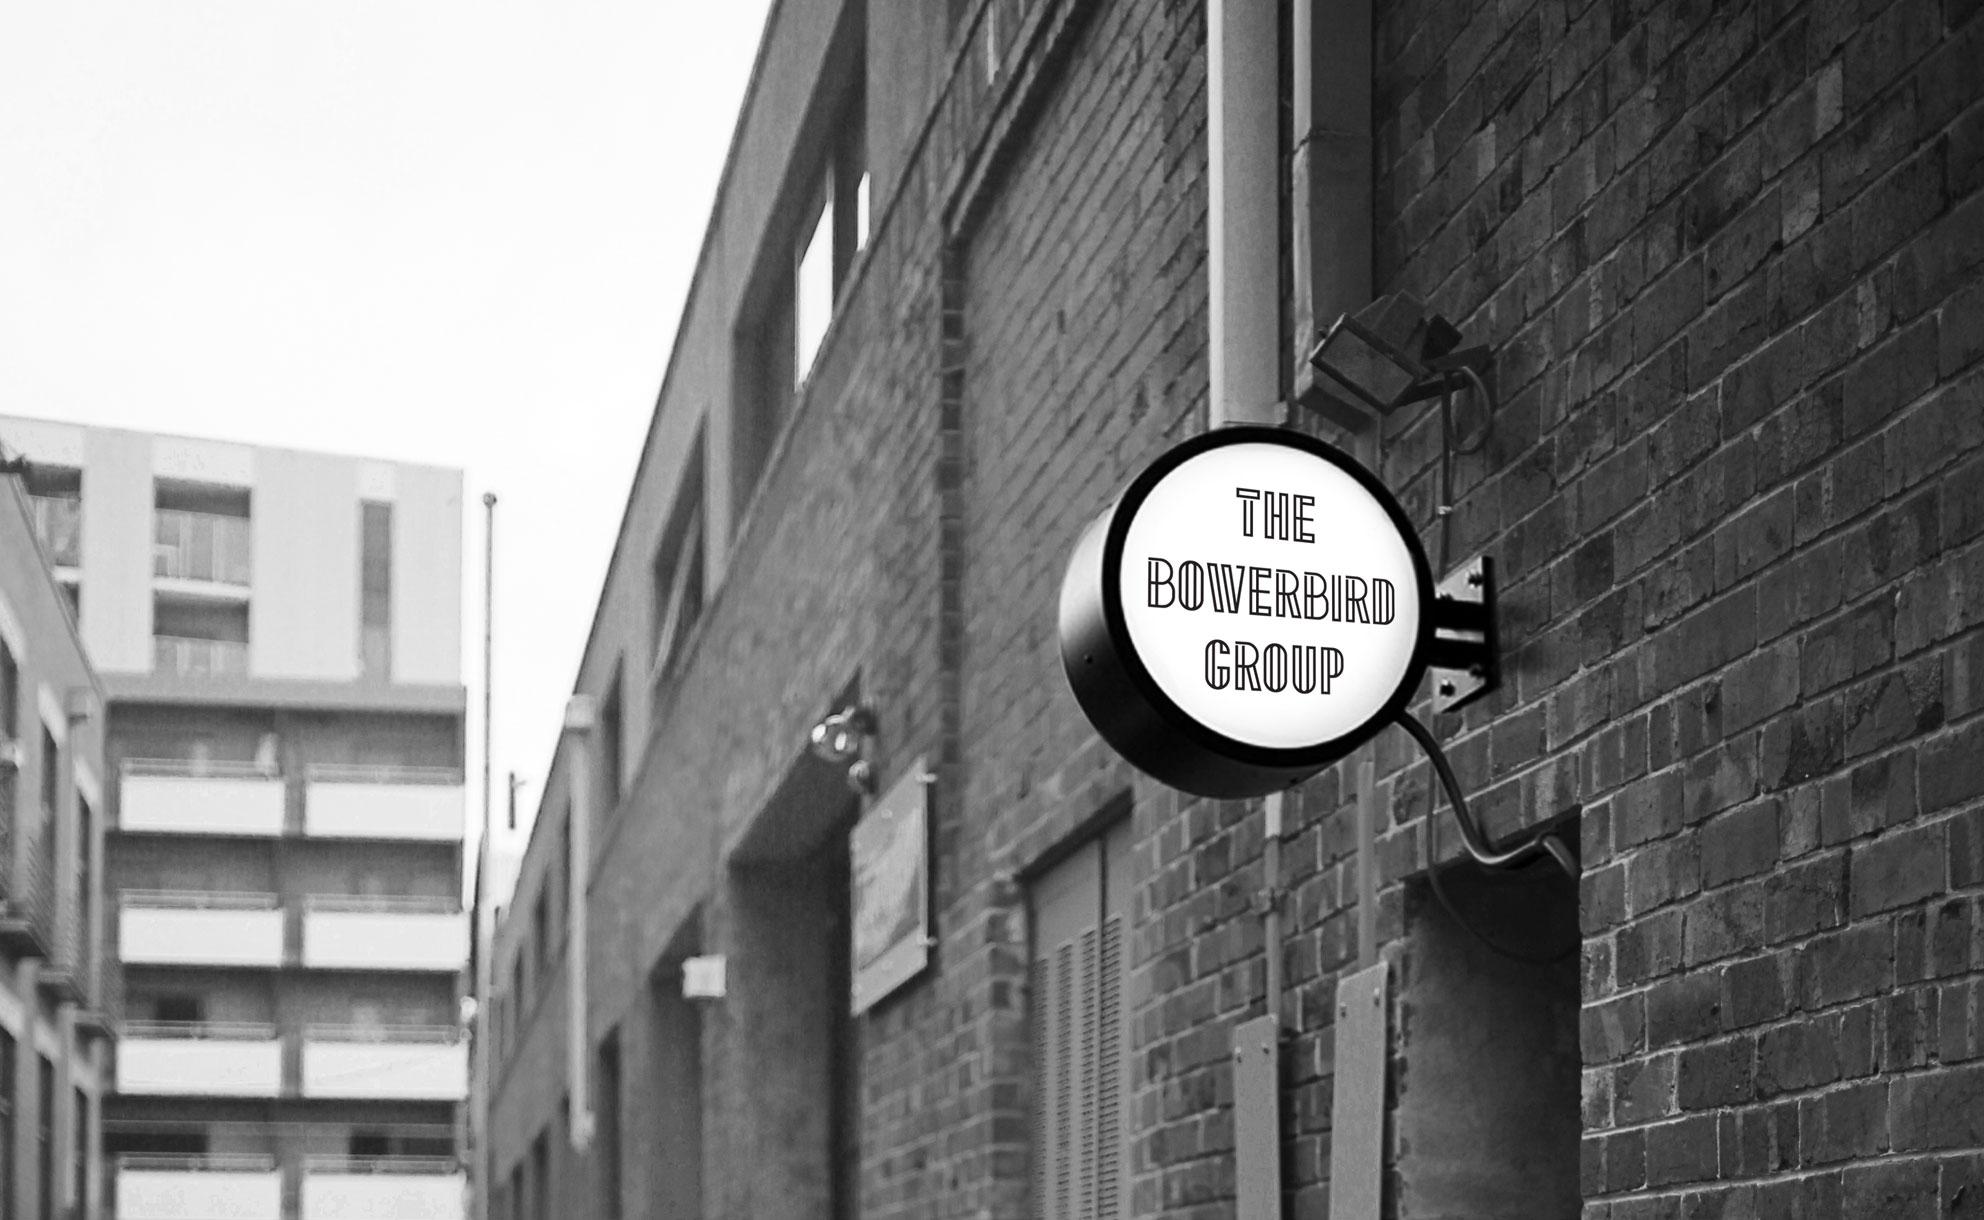 The Bowerbird Group - Signage